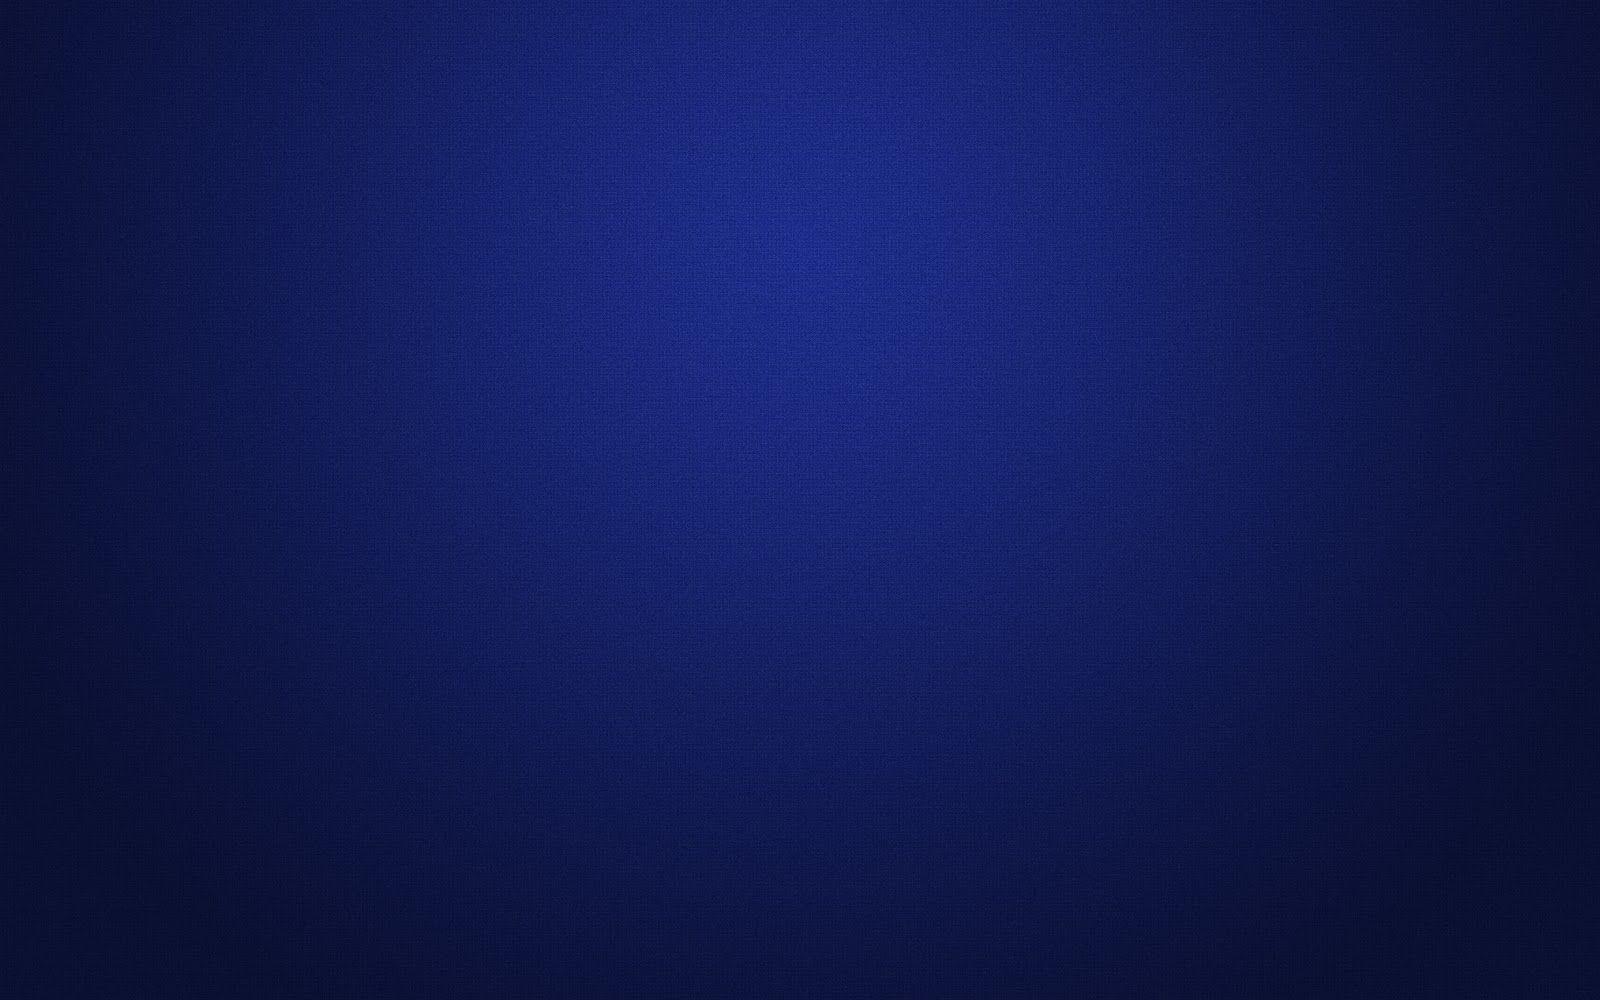 wallpaper black blue - photo #23